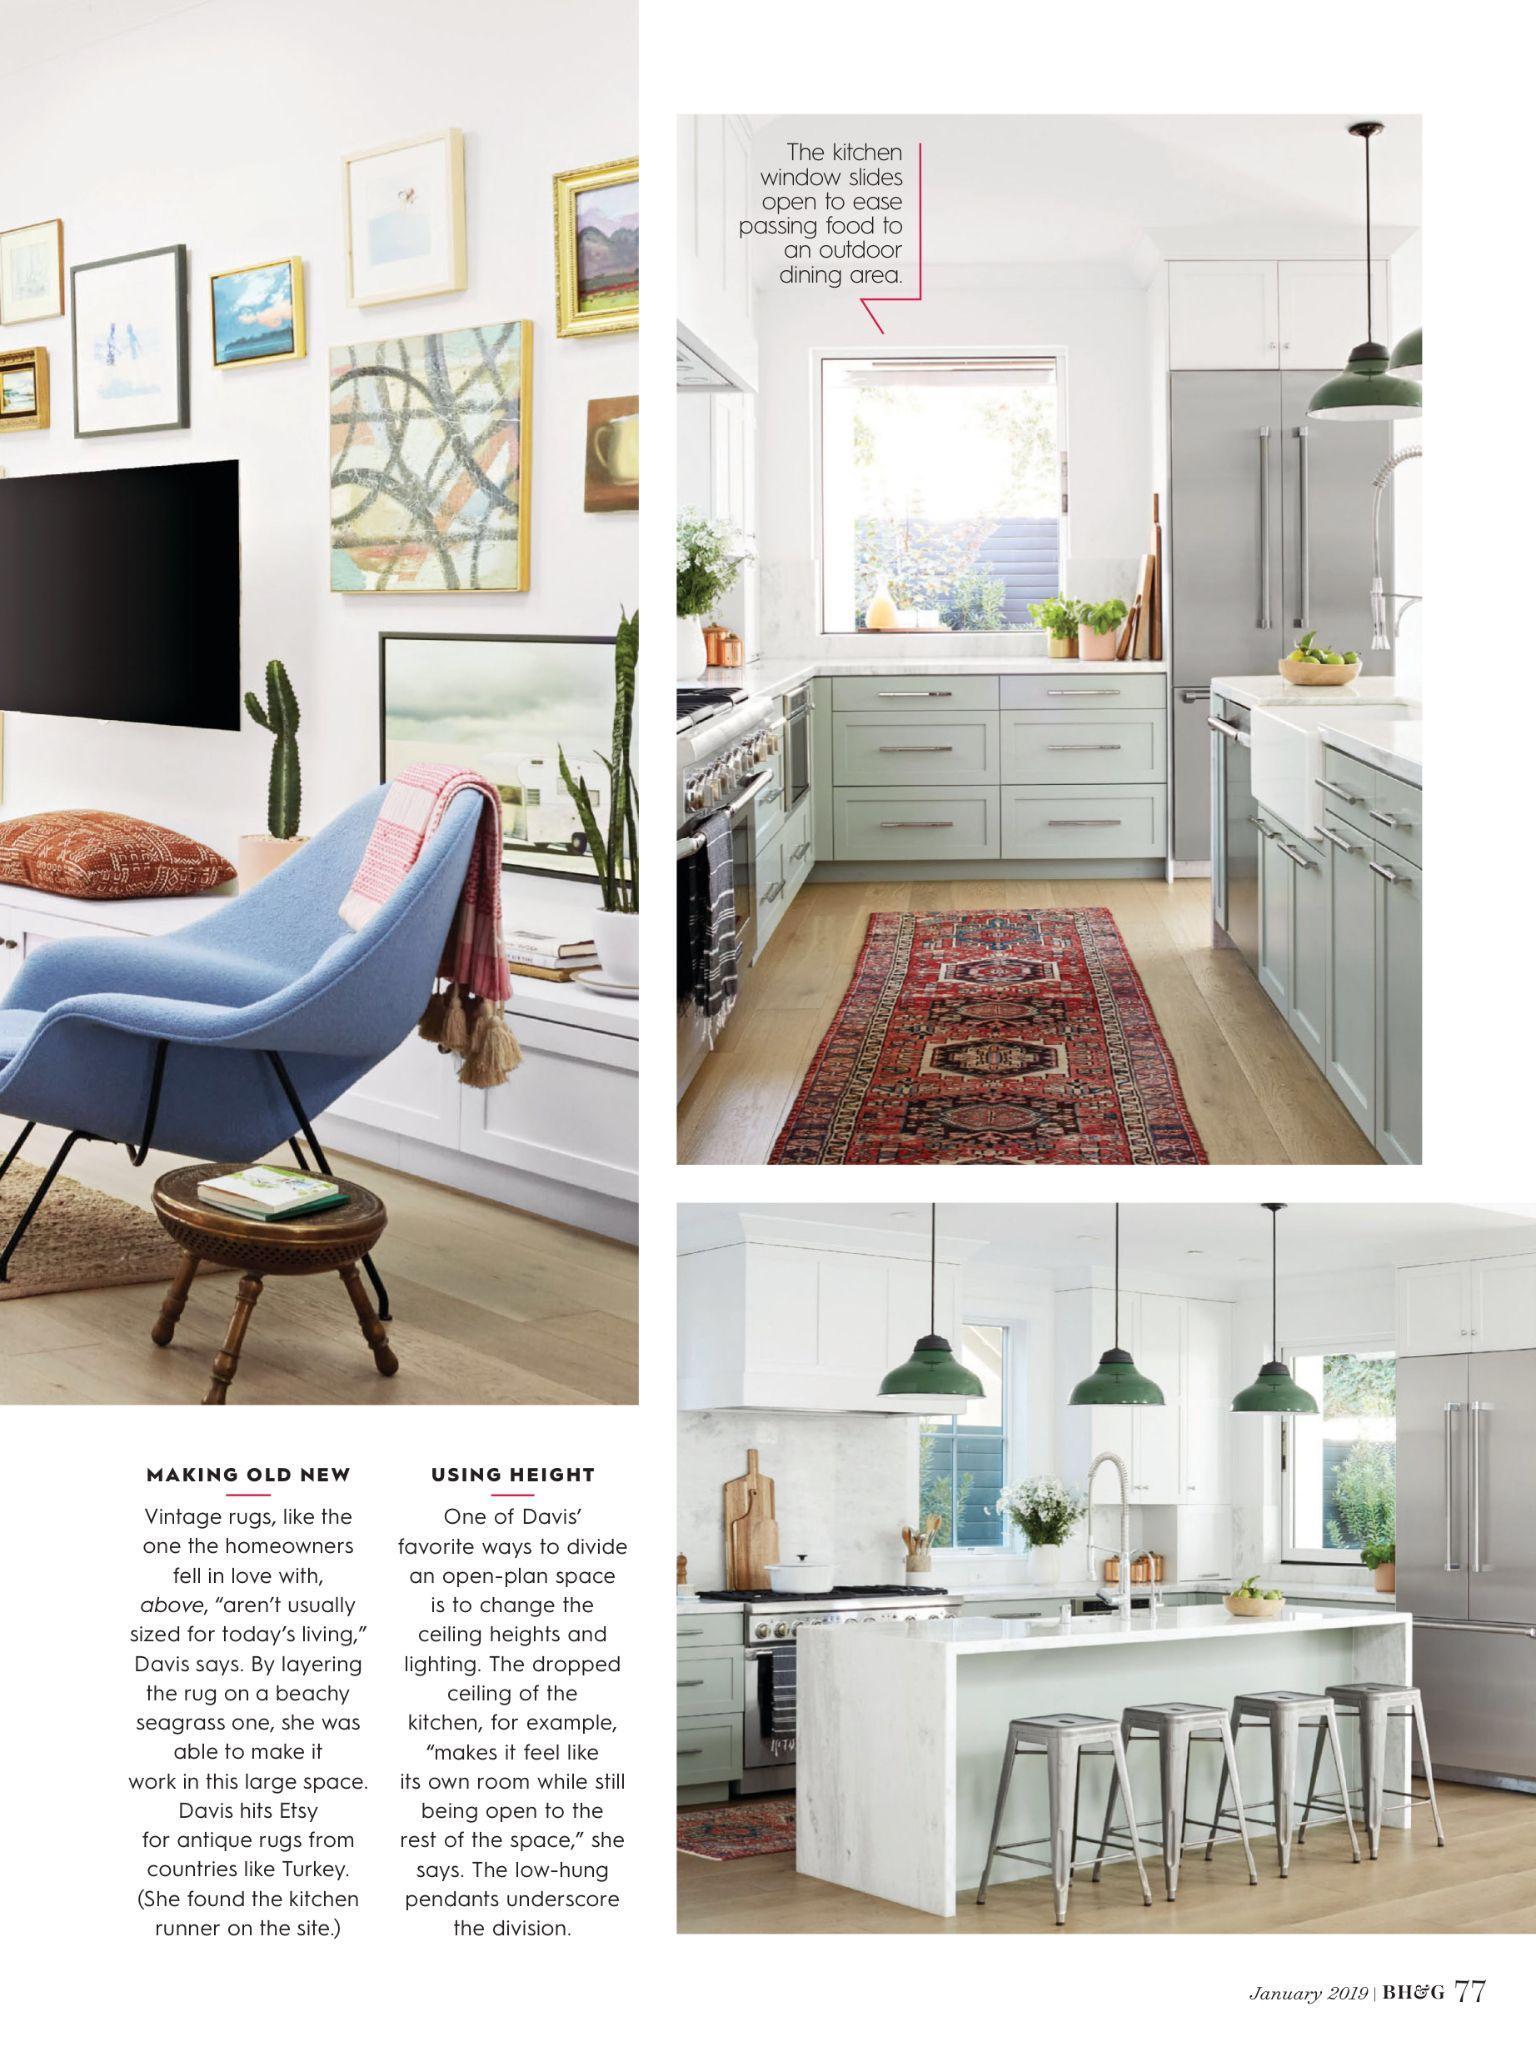 a37c955e8101a67233a5c7e2c503fb36 - January 2019 Better Homes And Gardens Magazine